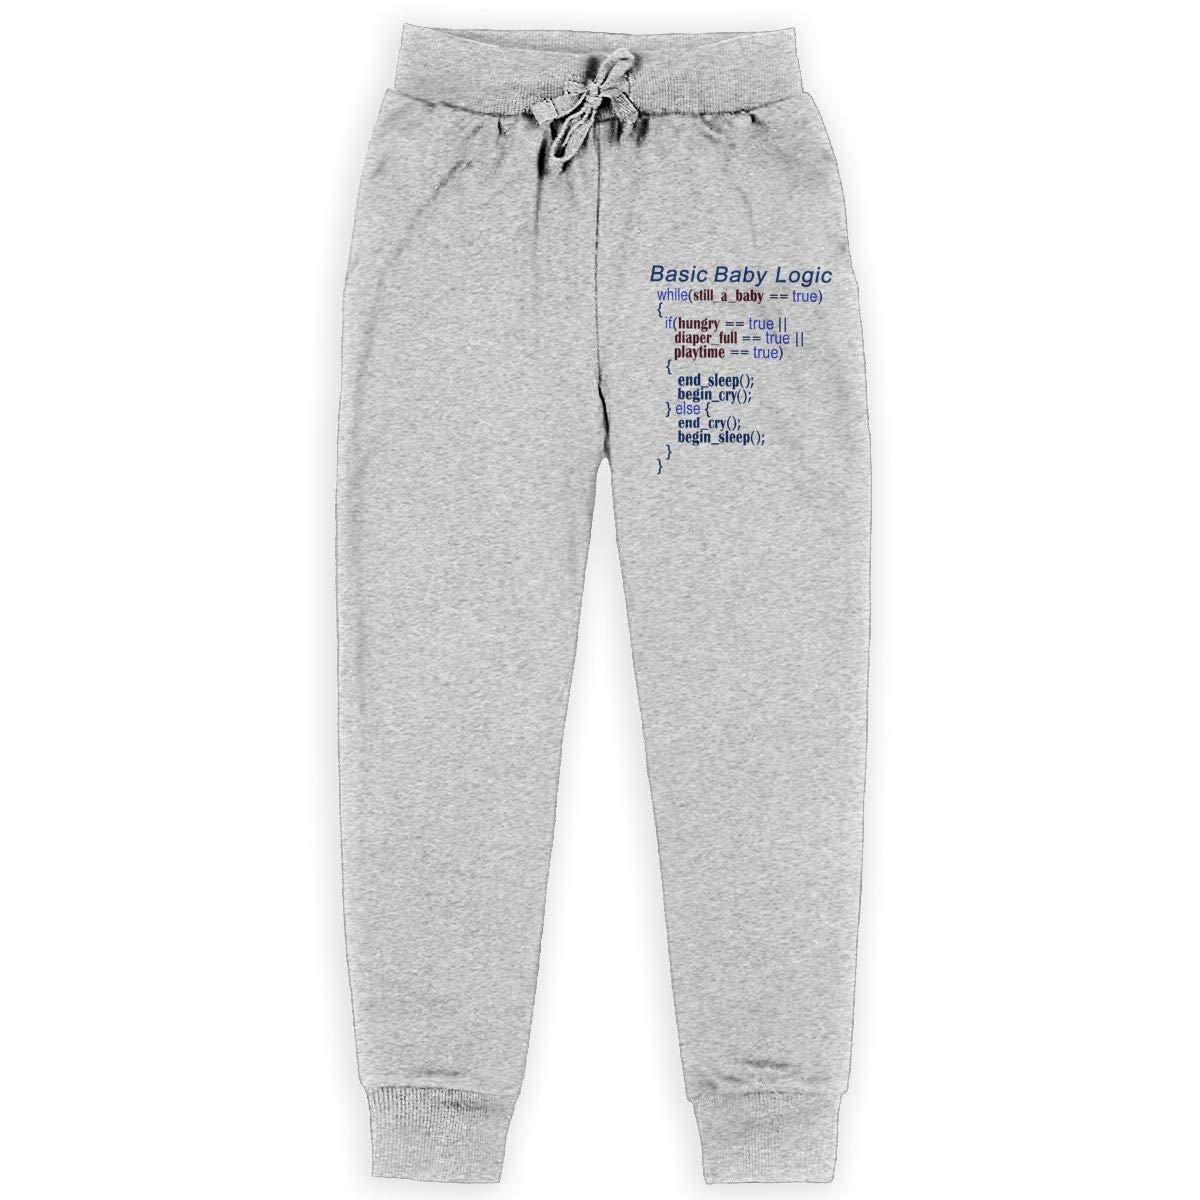 Be A Ice Basic Baby Logic Teen Boys Sweatpants Elastic Waist Pants Sports Pants